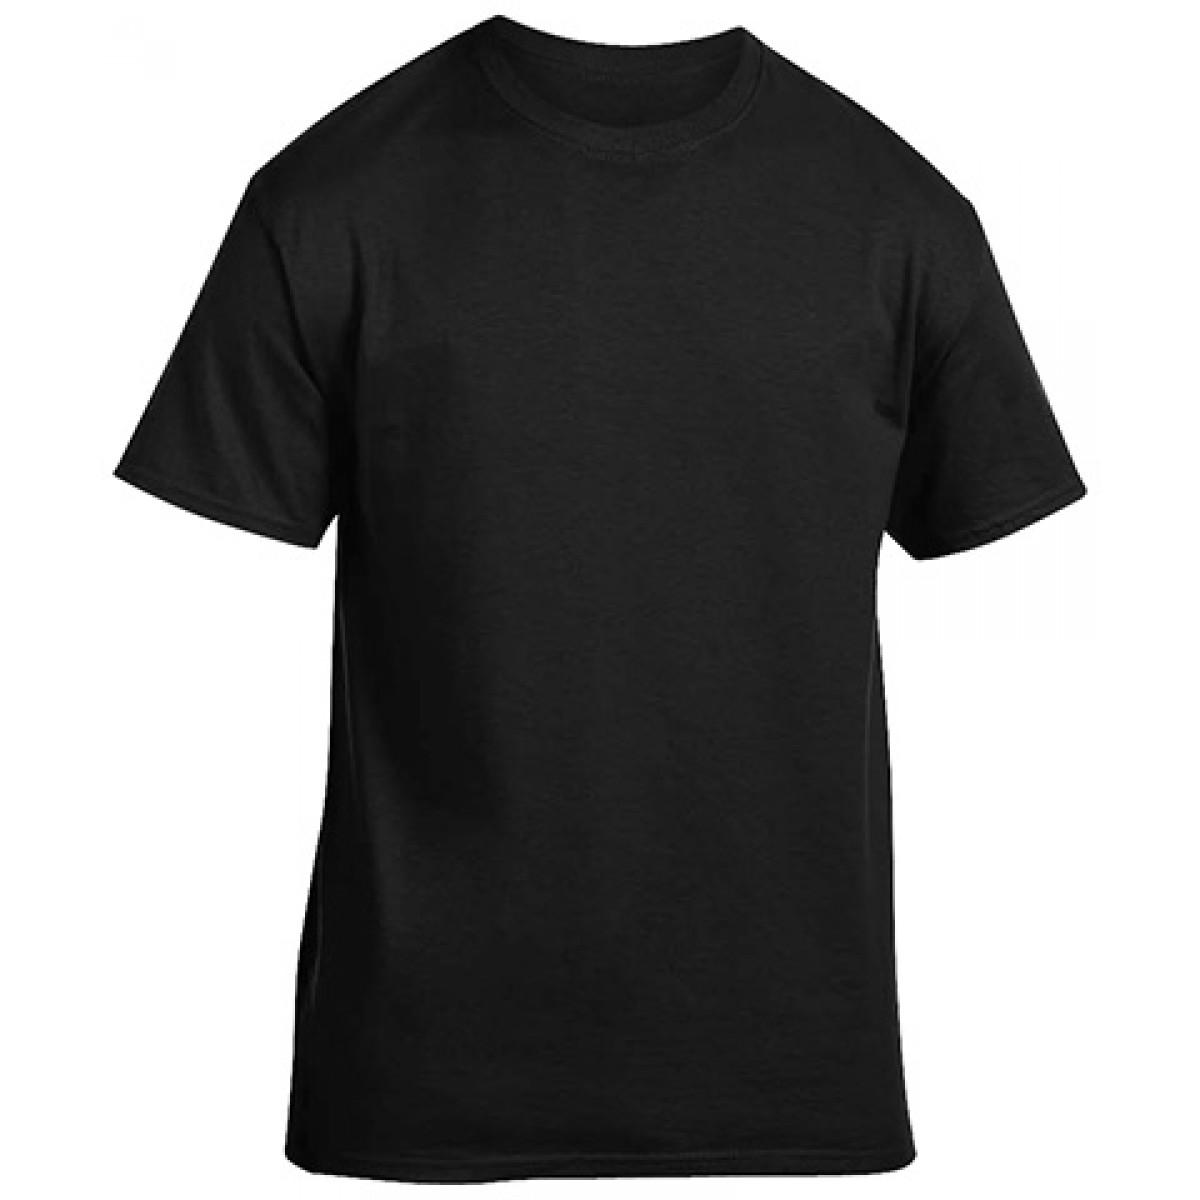 Cotton Short Sleeve T-Shirt - Black